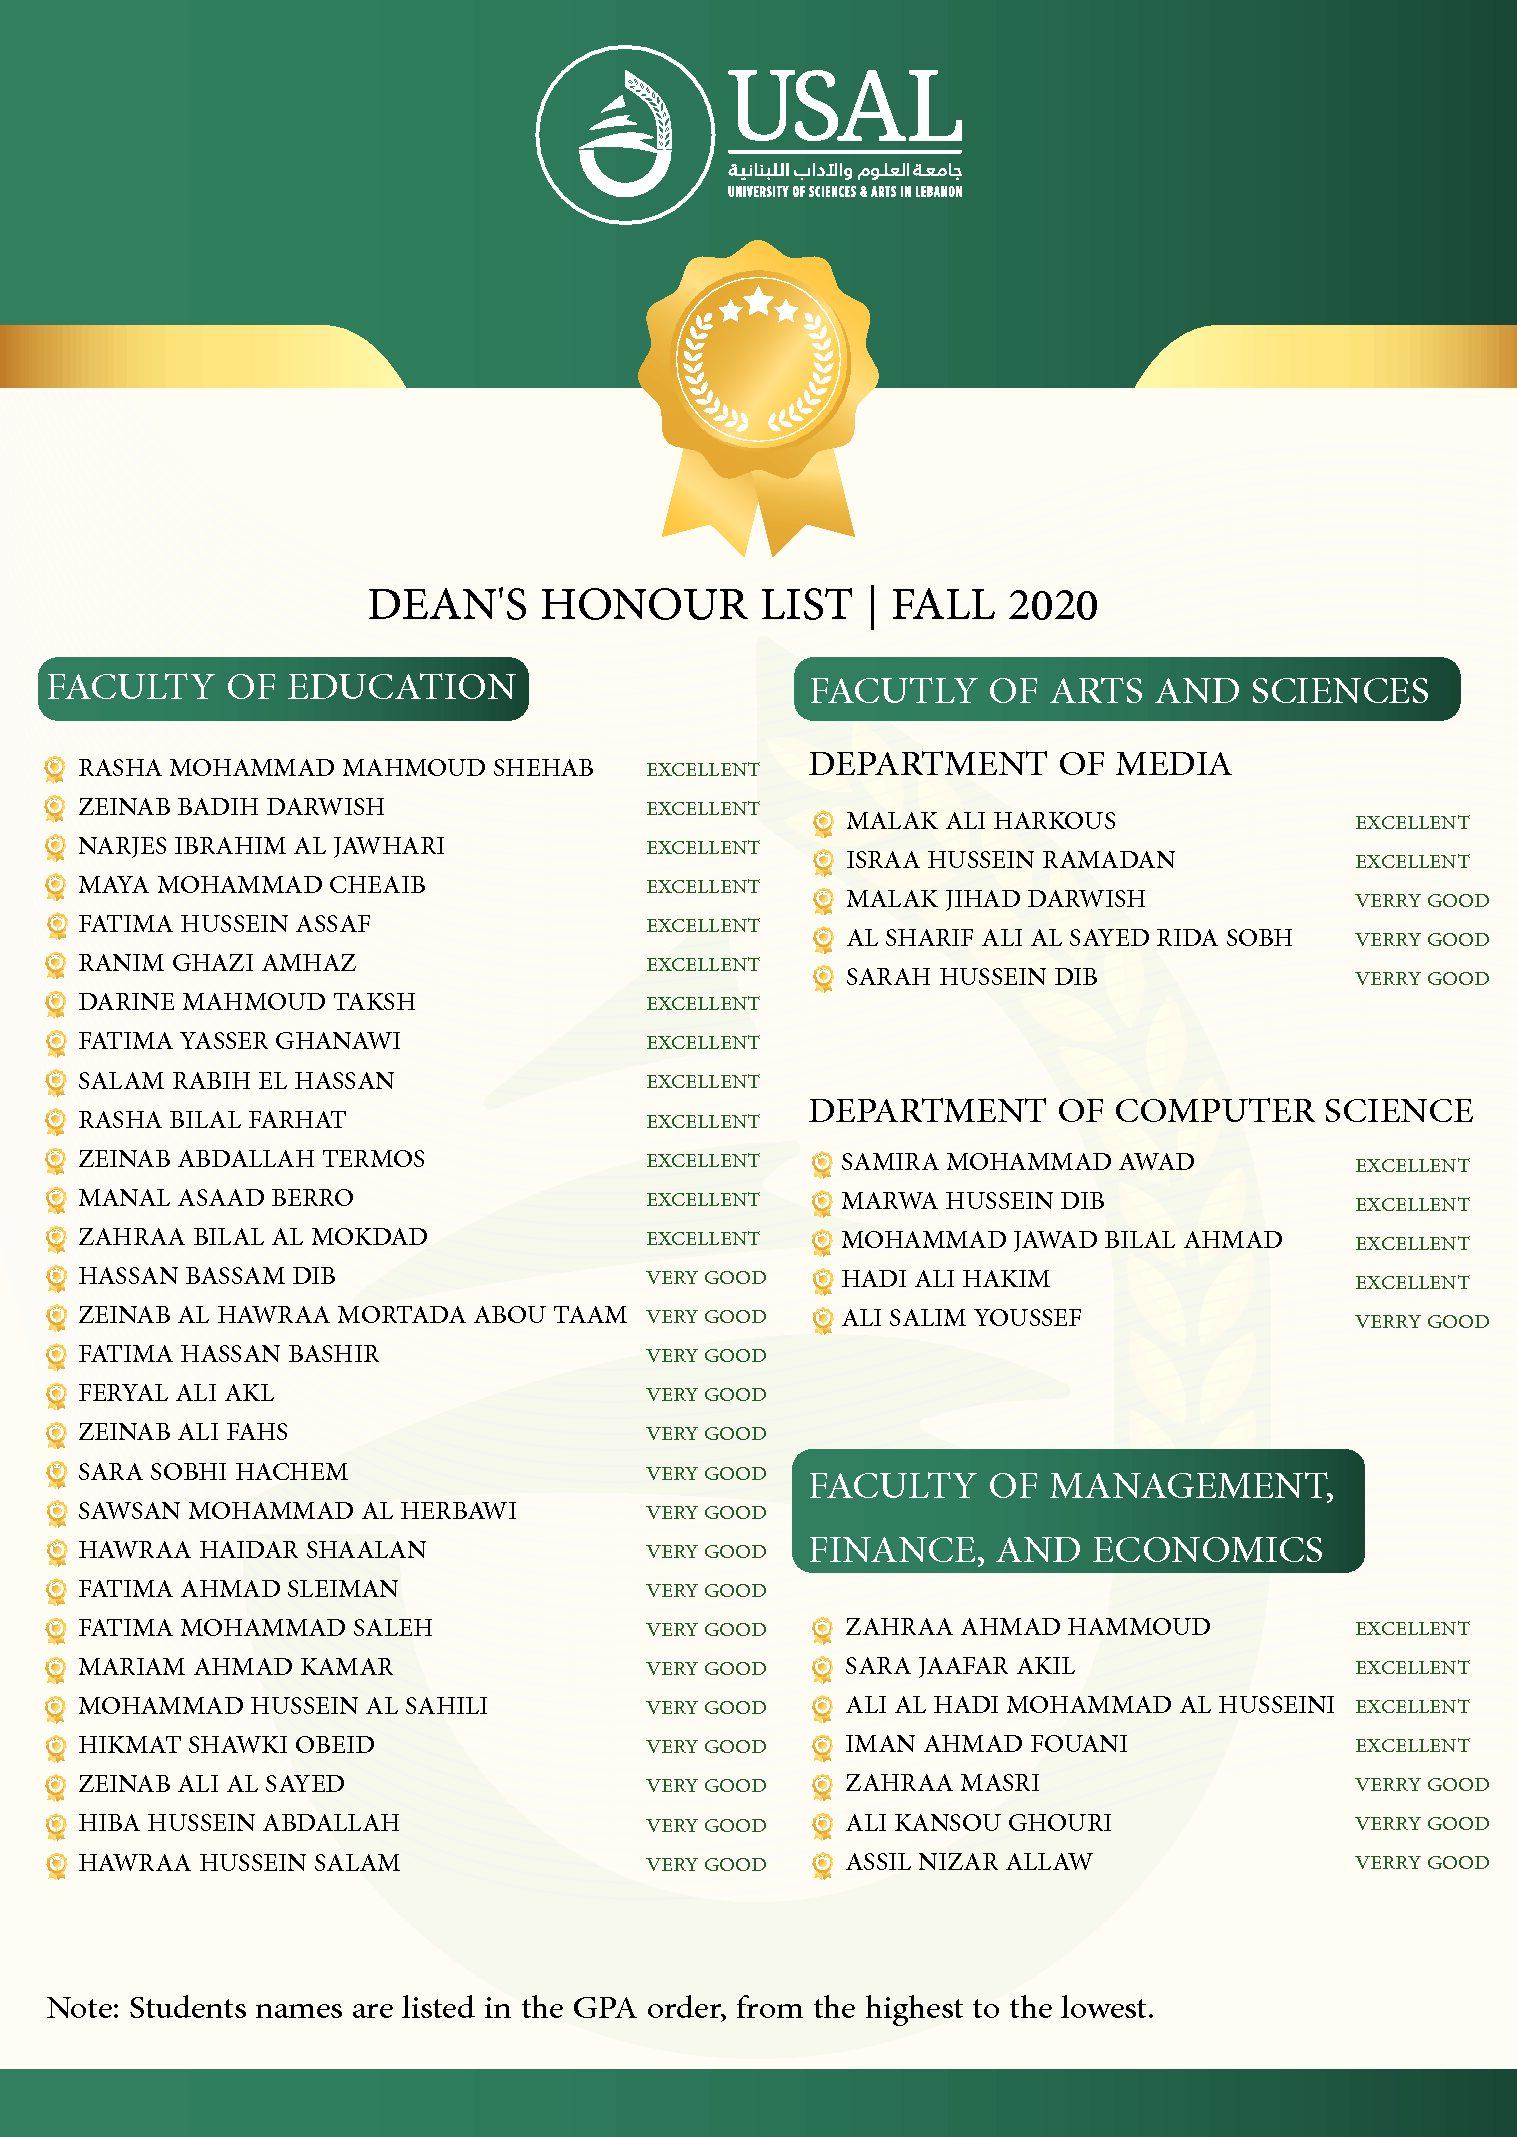 USAL honor list fall 2020